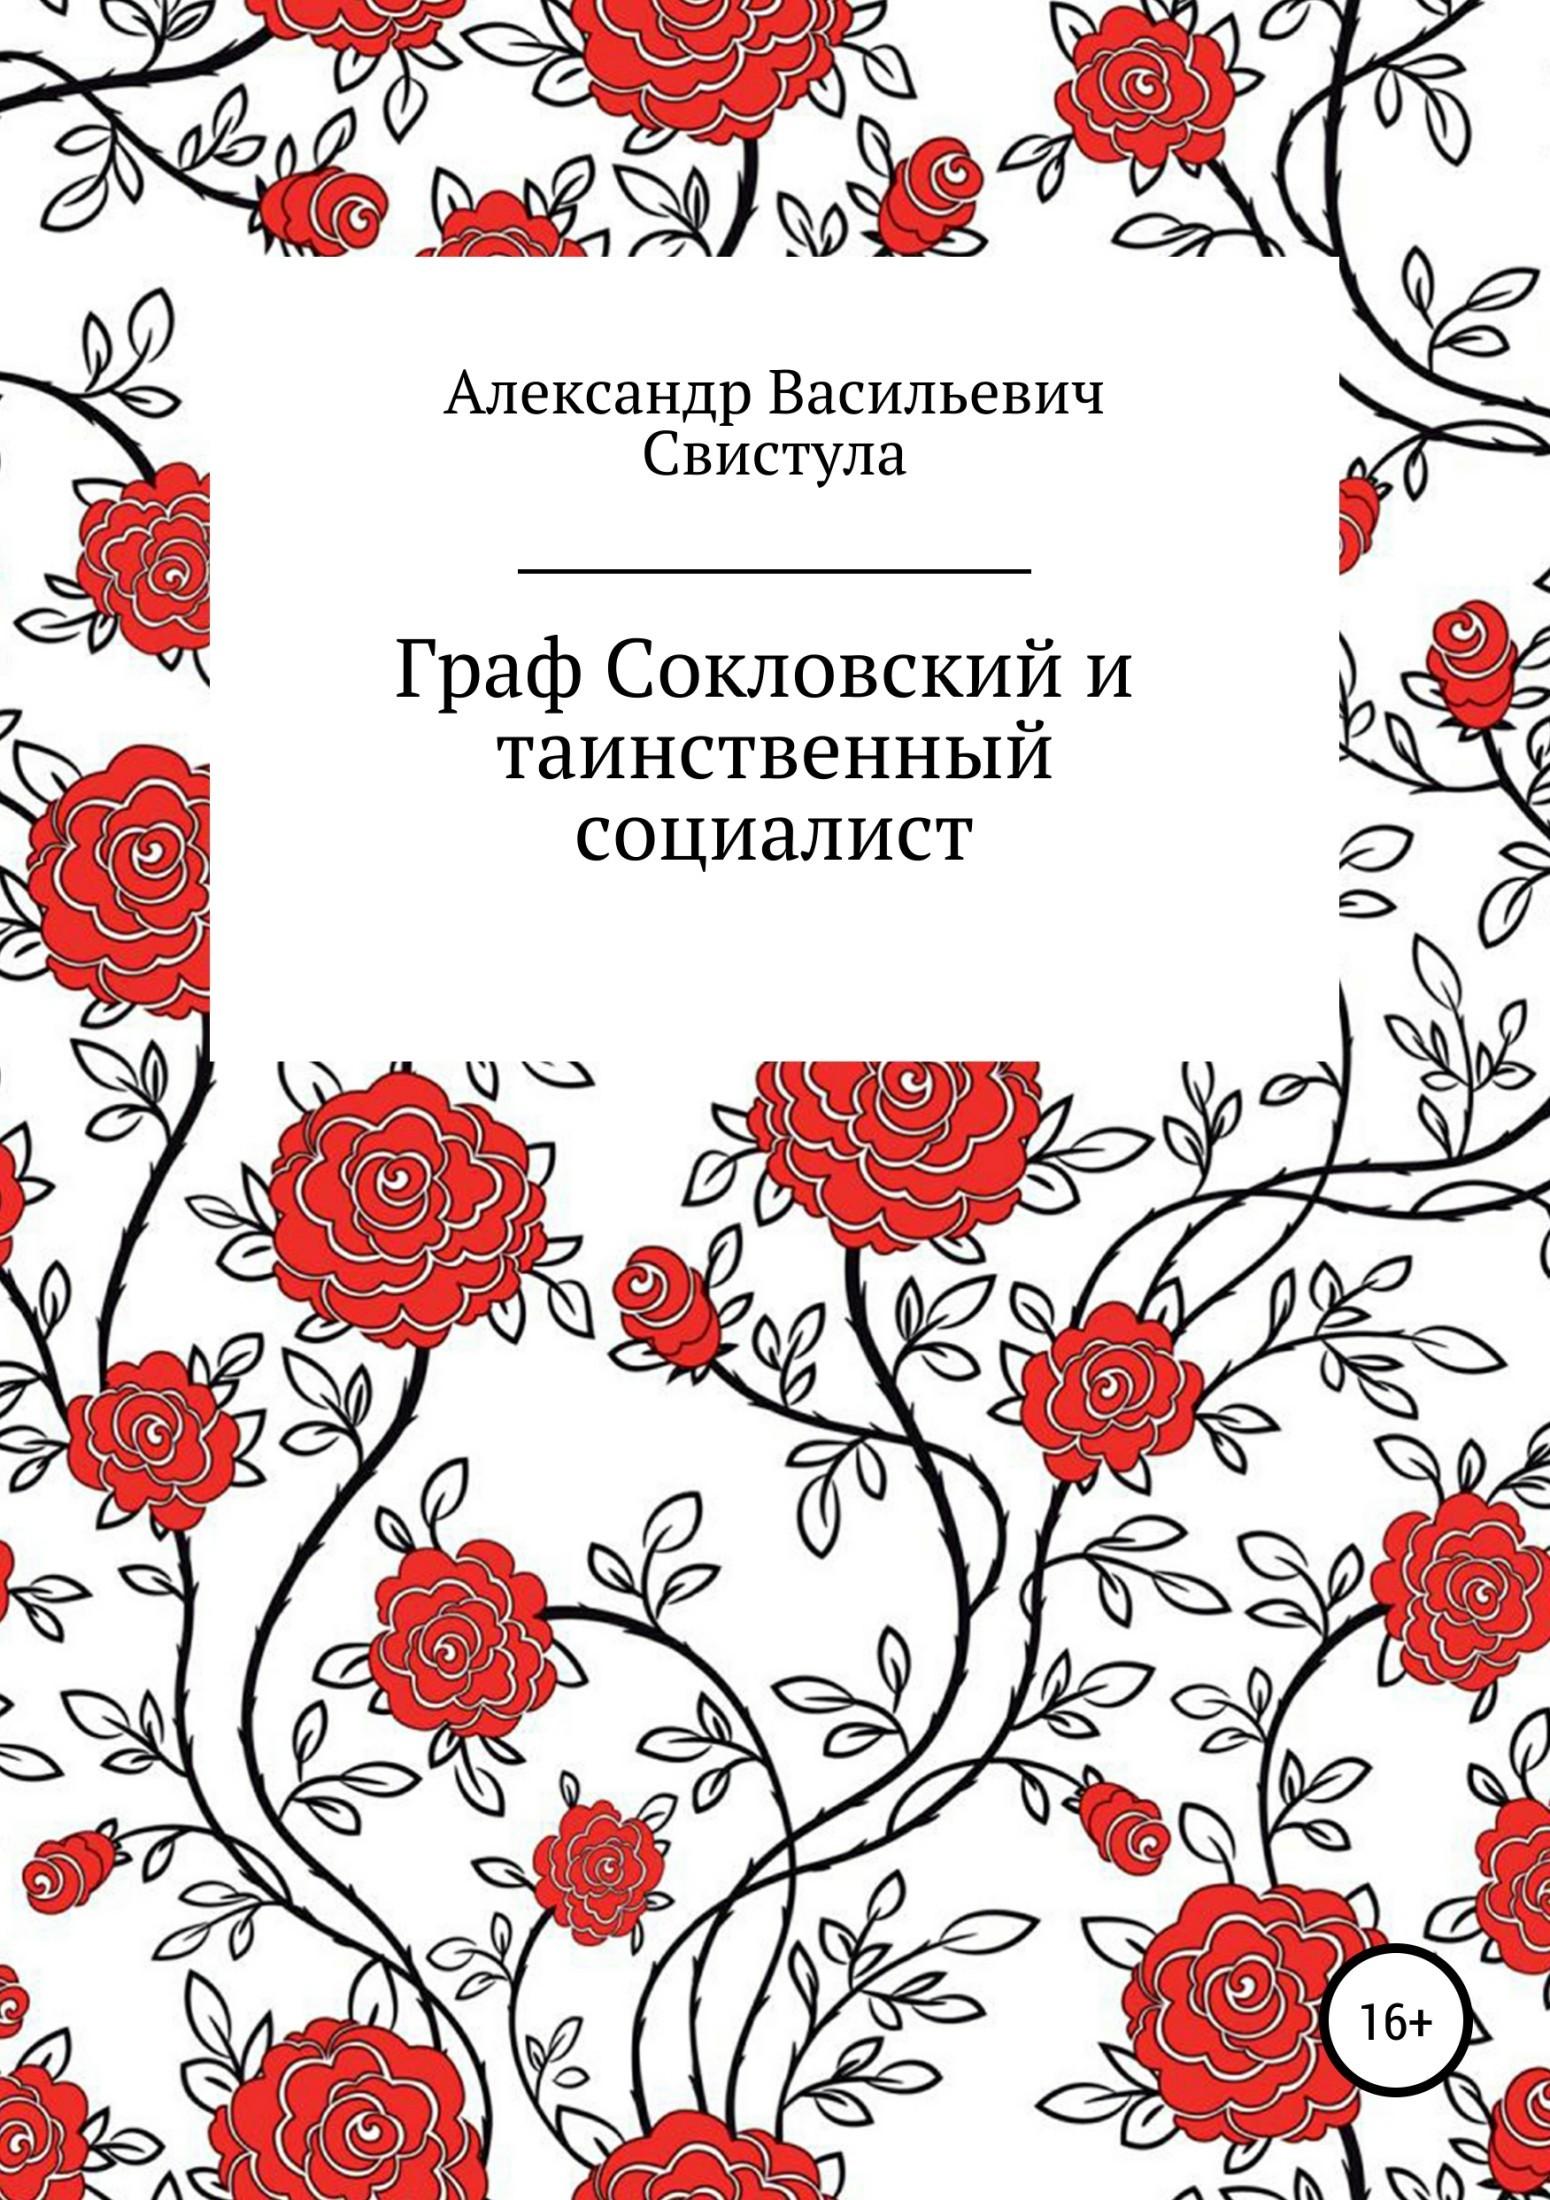 Обложка книги Граф Соколовский и таинственный социалист, автор Александр Васильевич Свистула